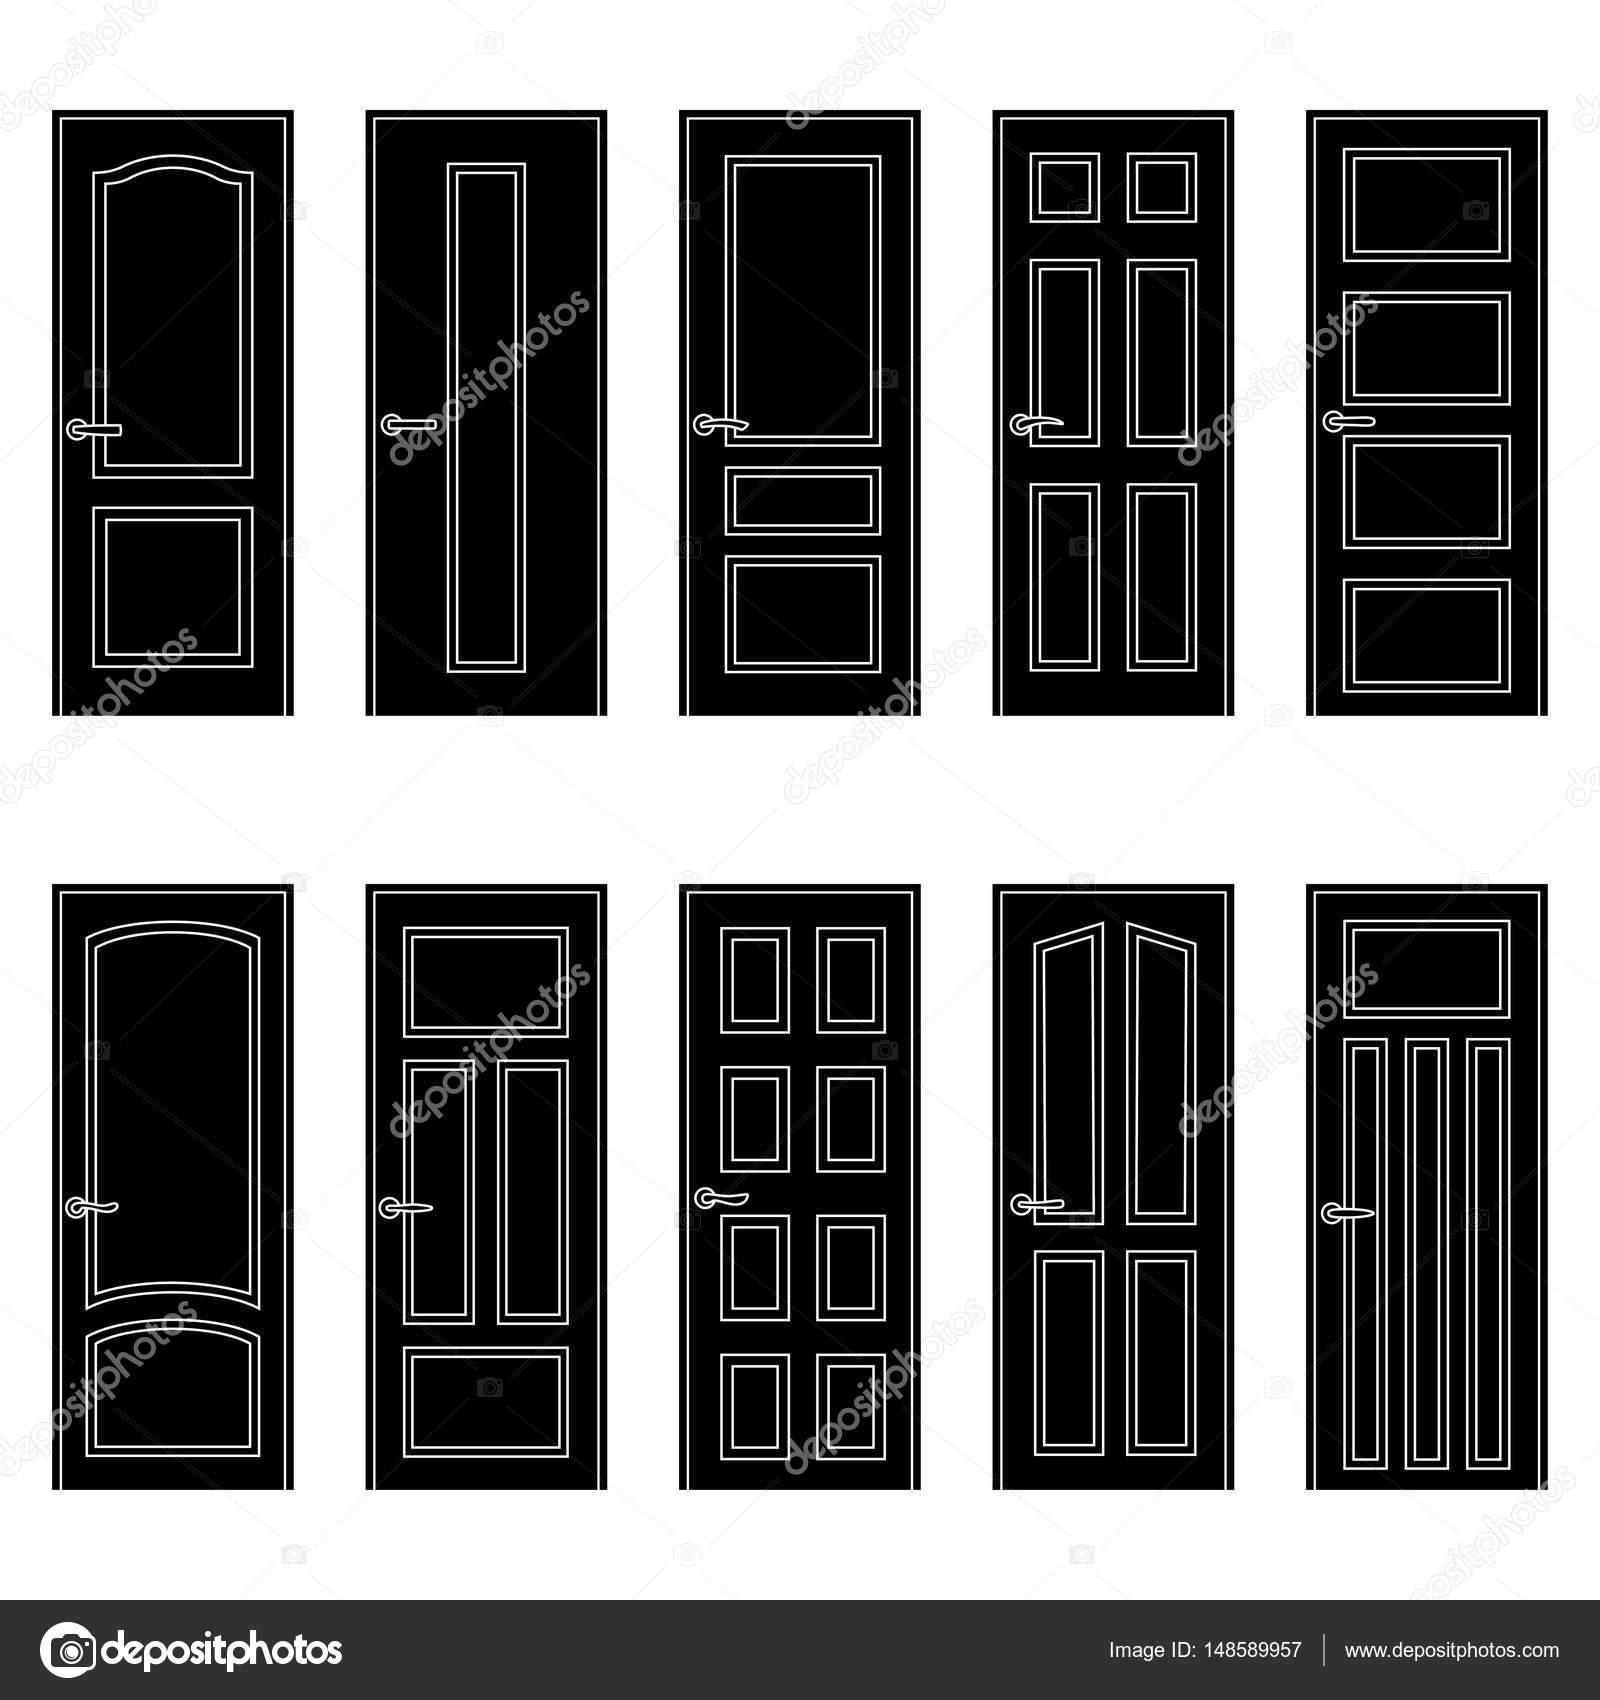 Set of black door icons vector illustration u2014 Stock Vector #148589957  sc 1 st  Depositphotos & Set of black door icons vector illustration u2014 Stock Vector ... pezcame.com